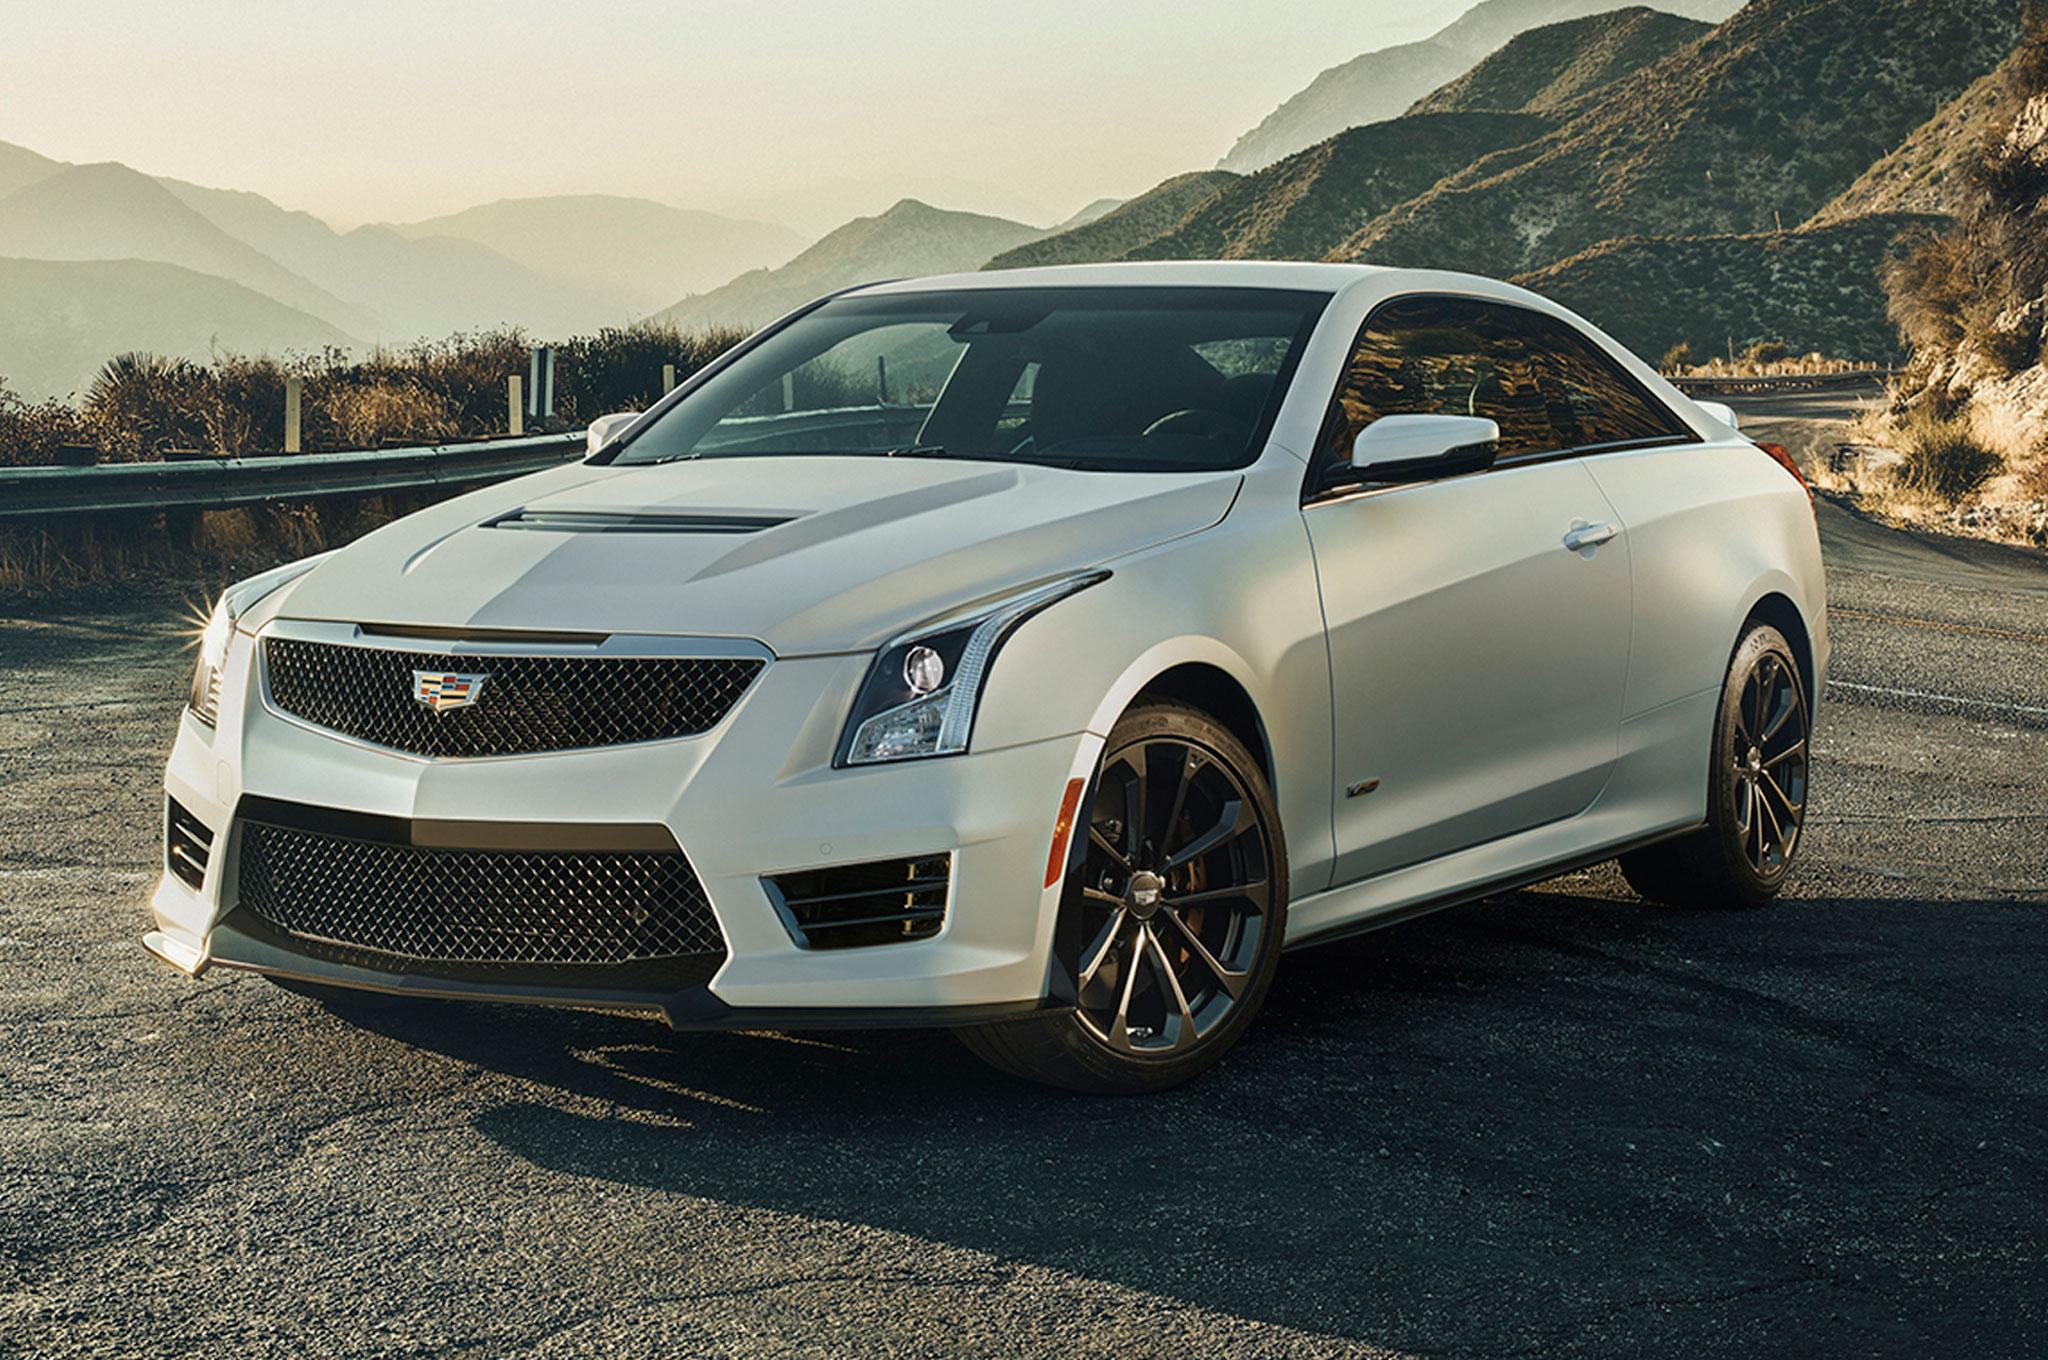 2016 Cadillac ATS V Coupe Front Three Quarter View